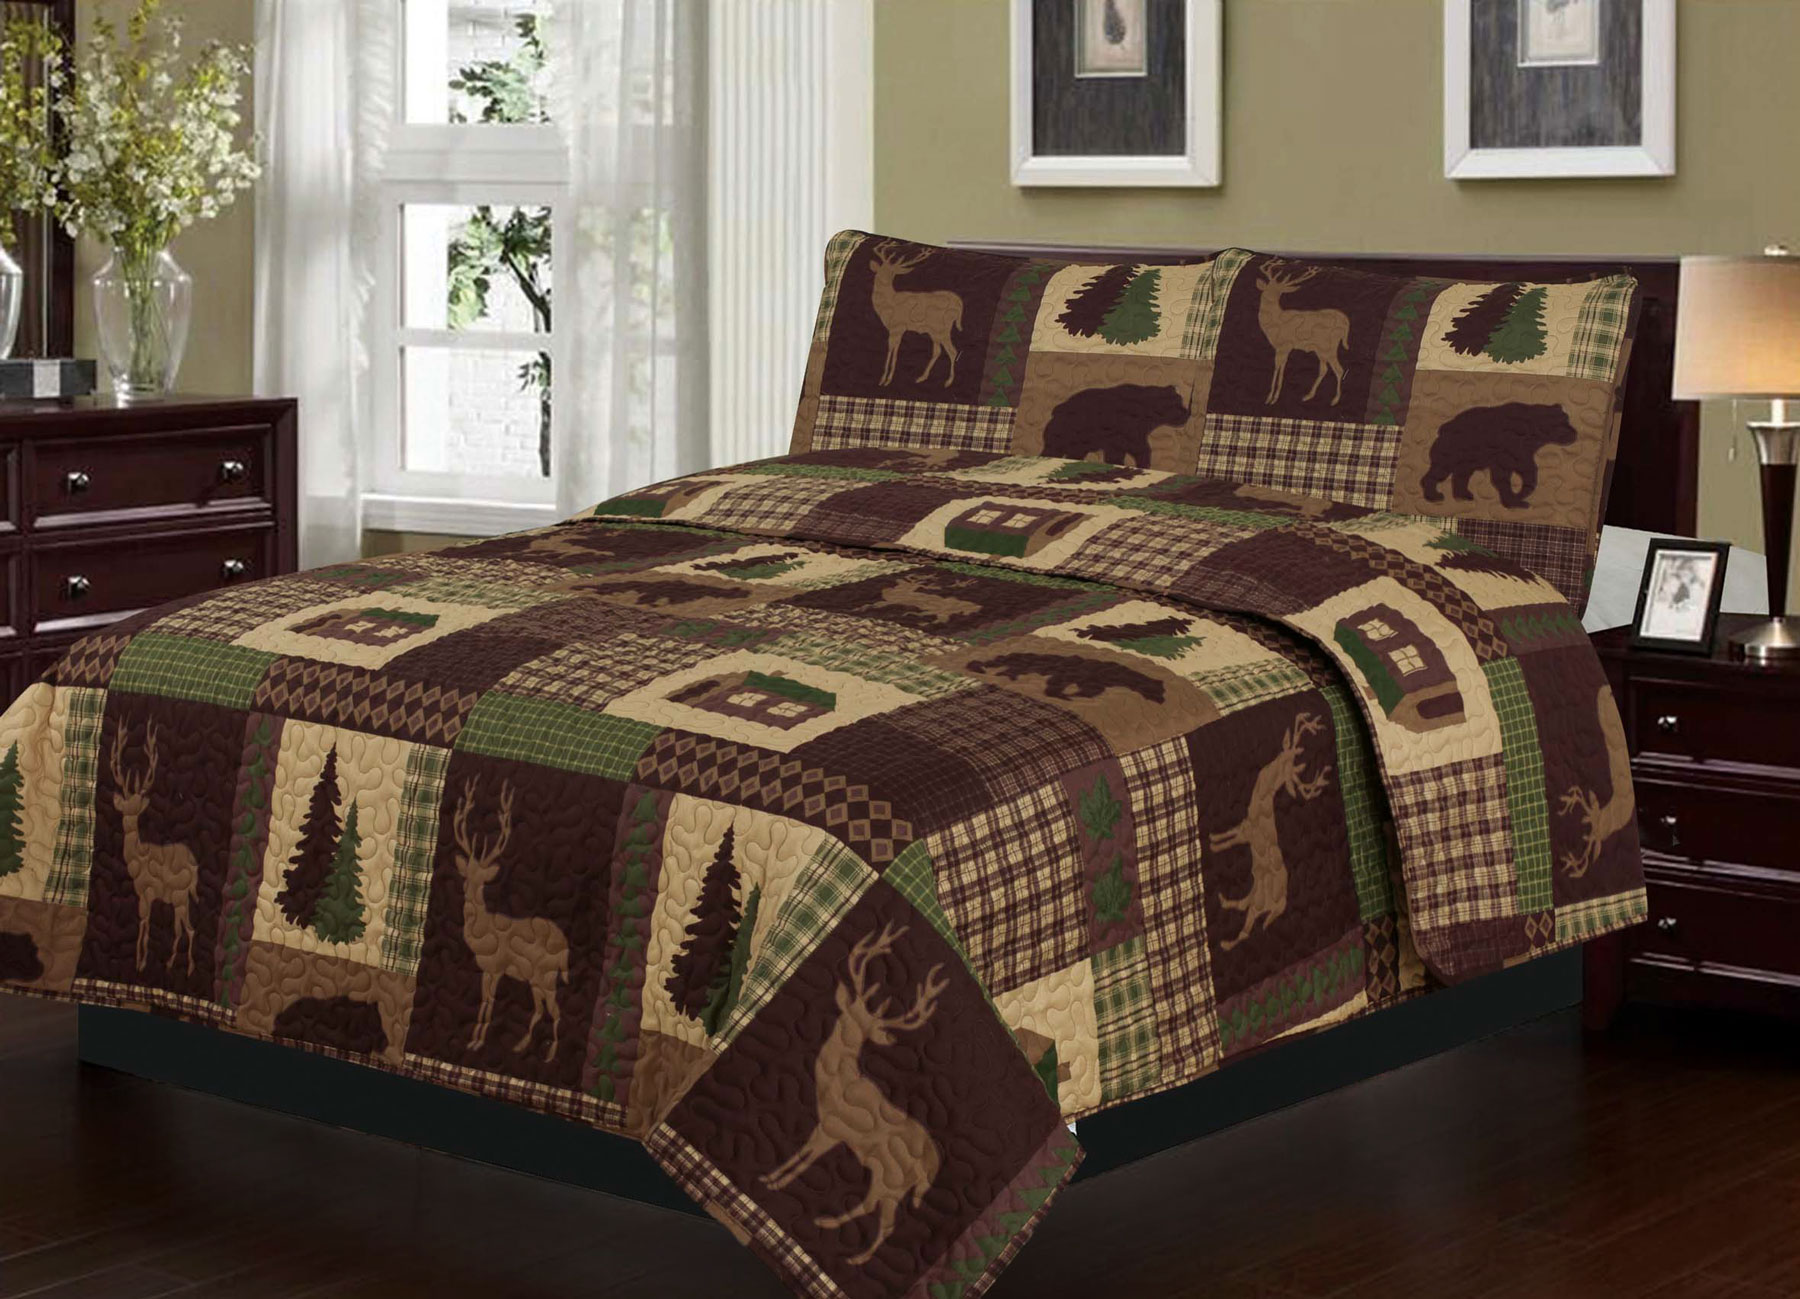 Walmart Quilts Queen Bedspreads And